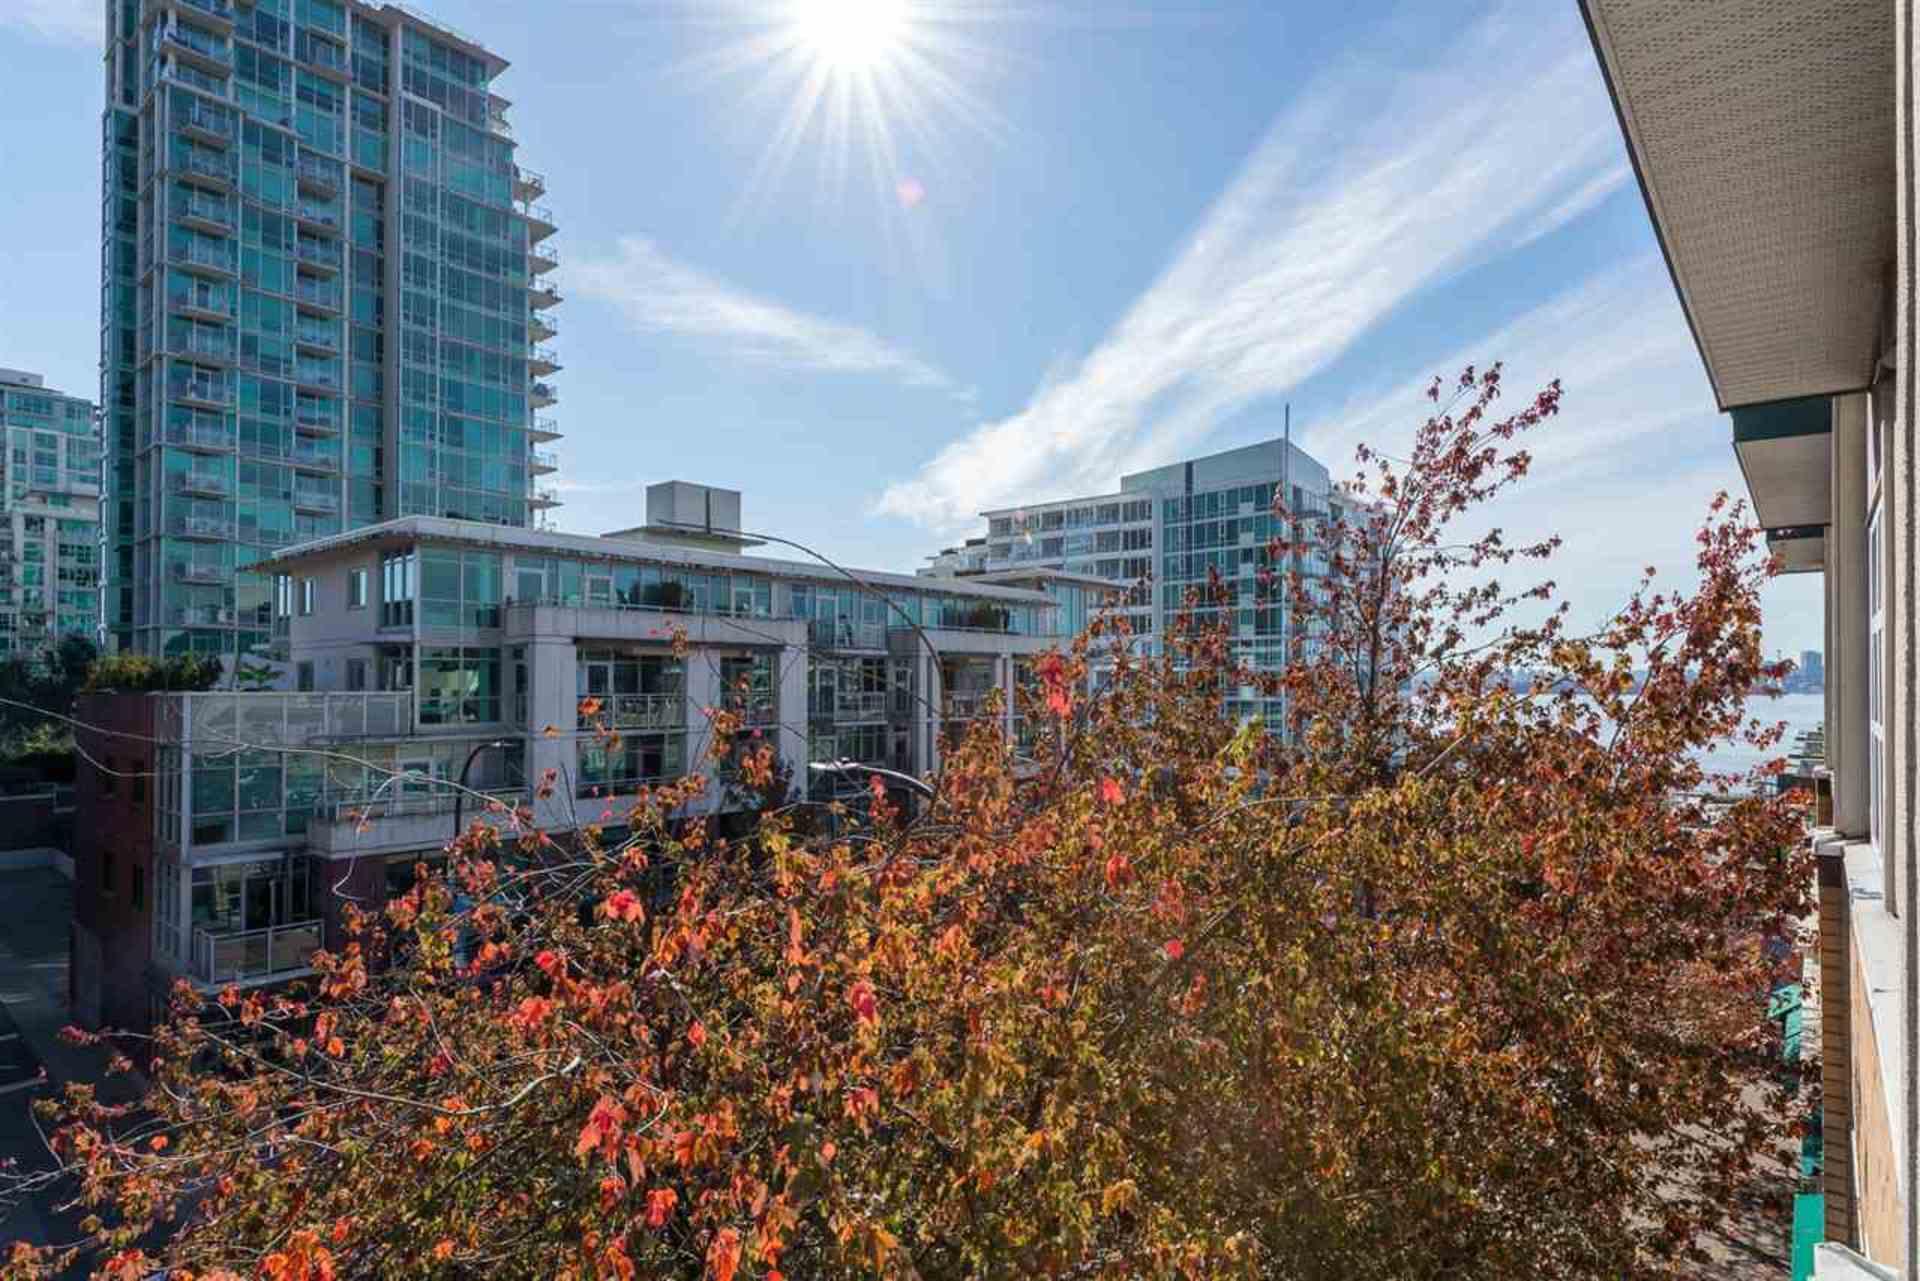 108-w-esplanade-avenue-lower-lonsdale-north-vancouver-17 at 407 - 108 W Esplanade Avenue, Lower Lonsdale, North Vancouver